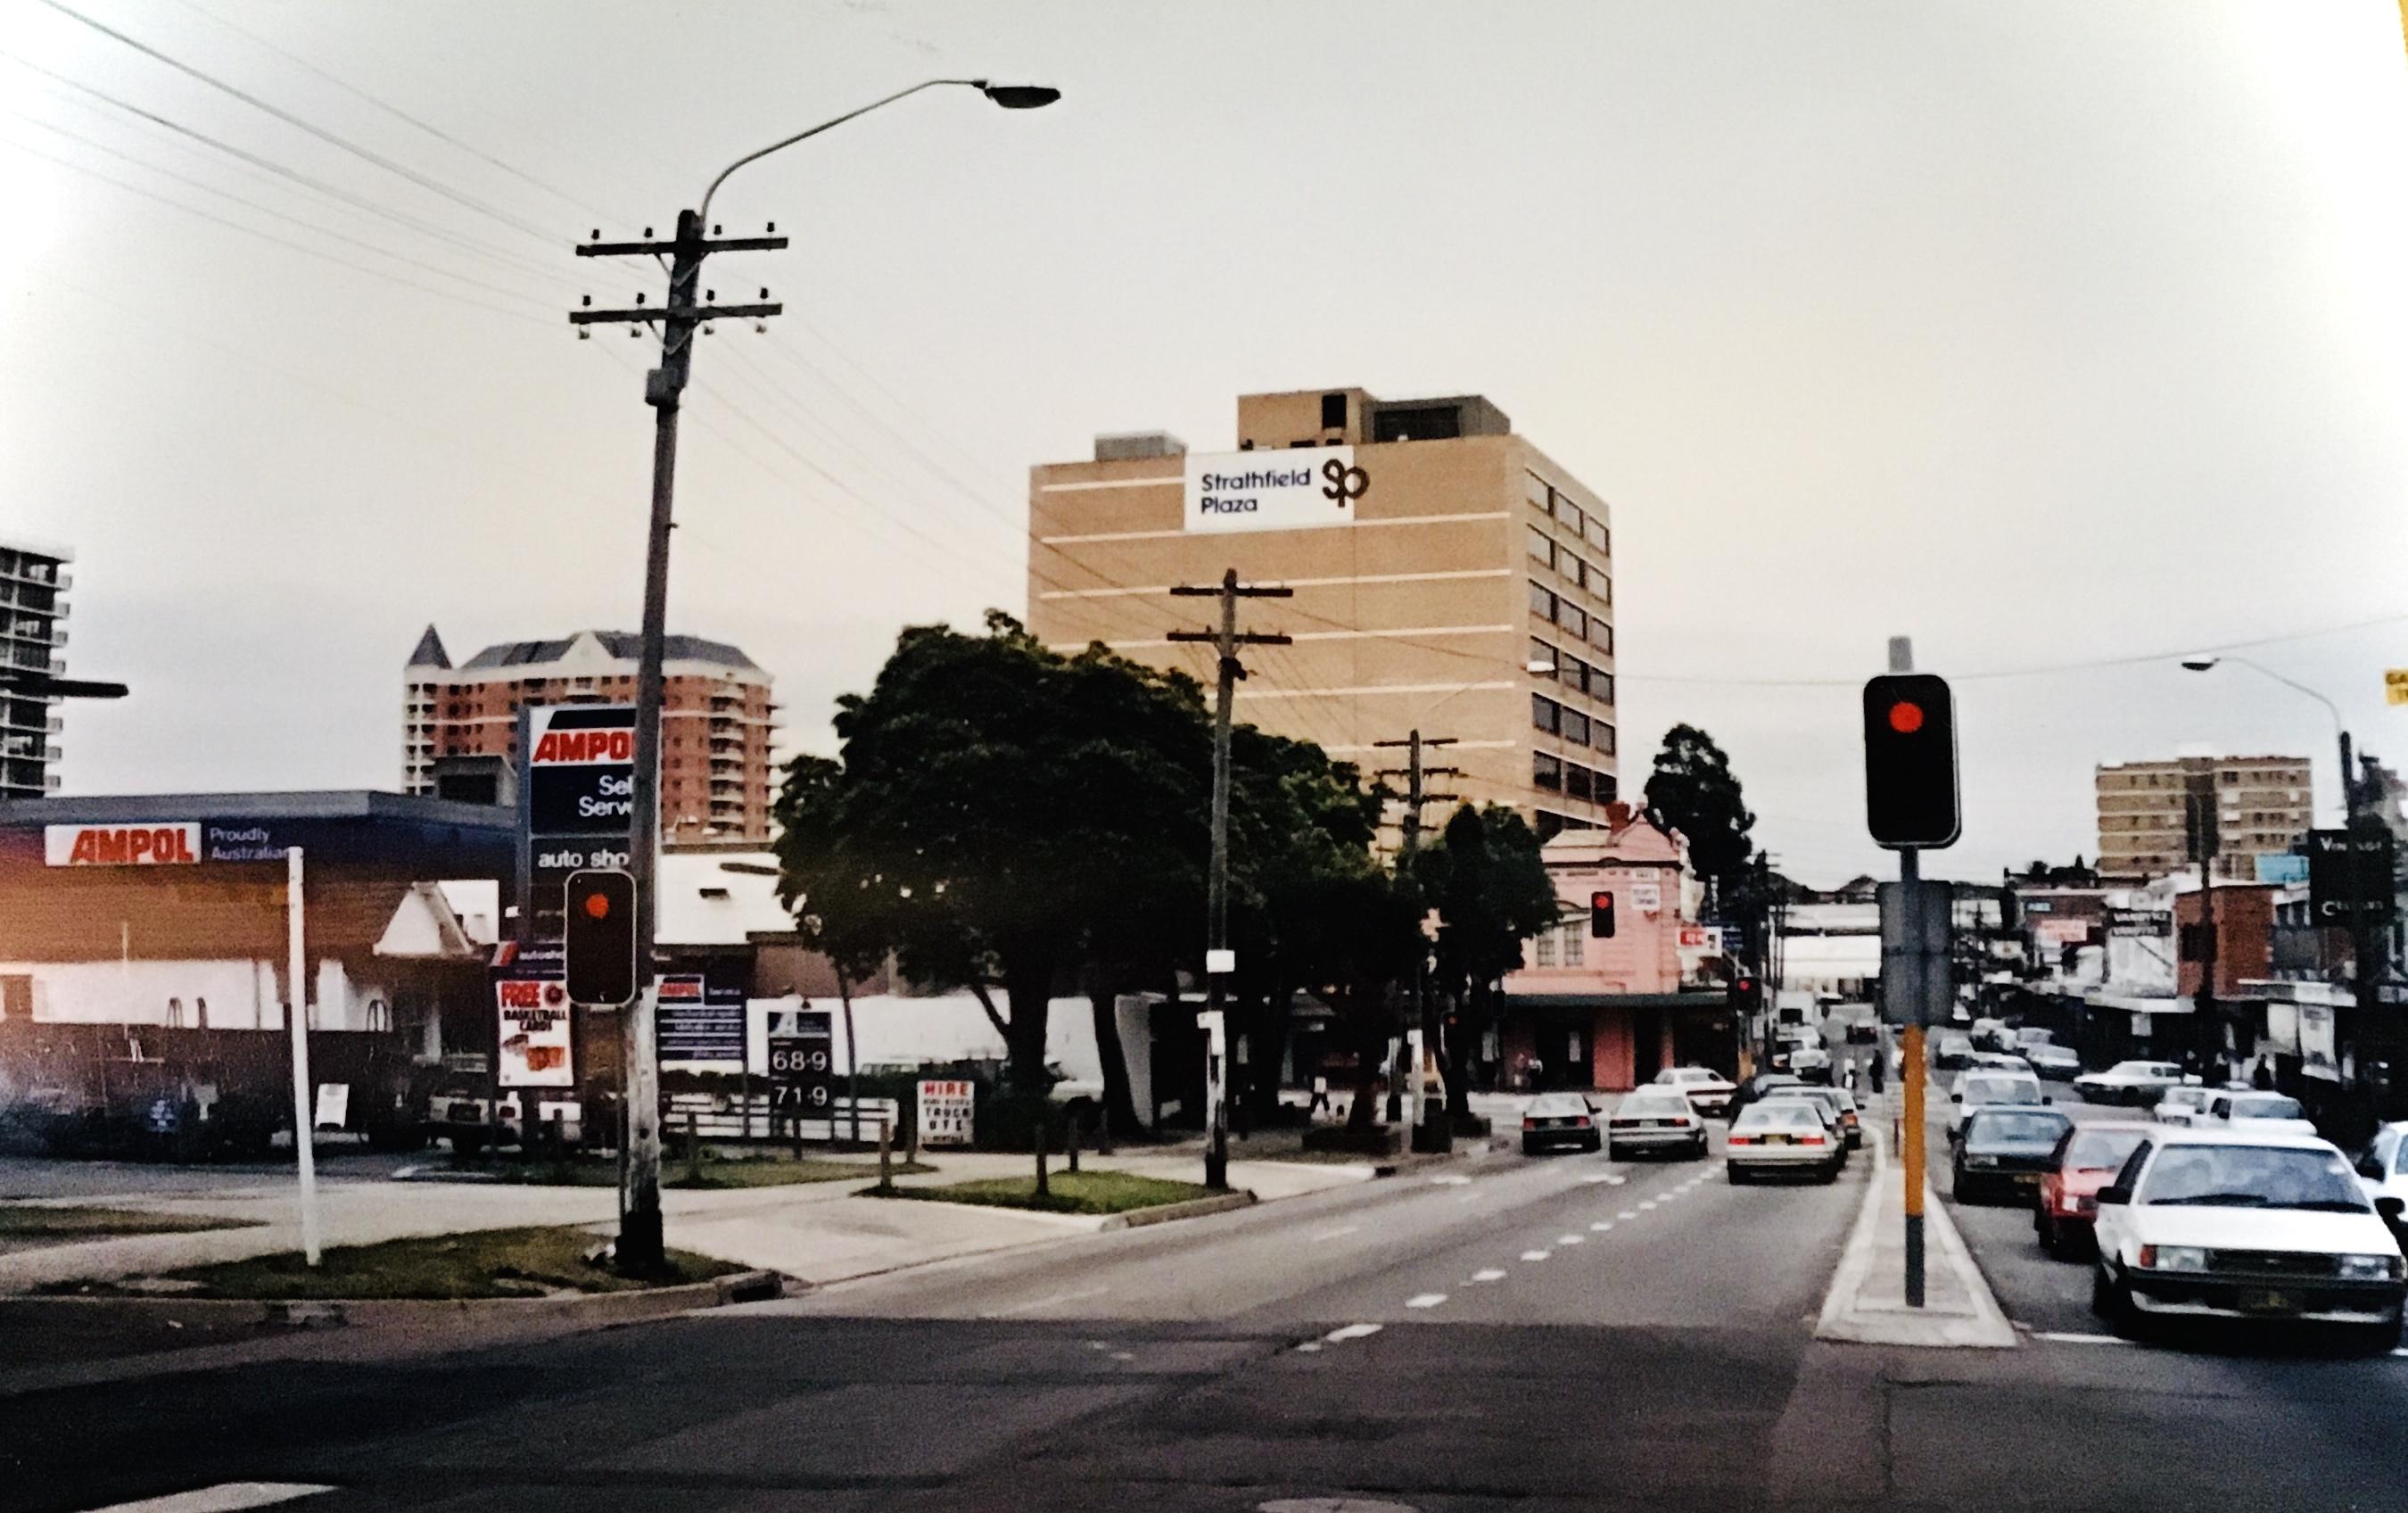 Strathfield Town Centre